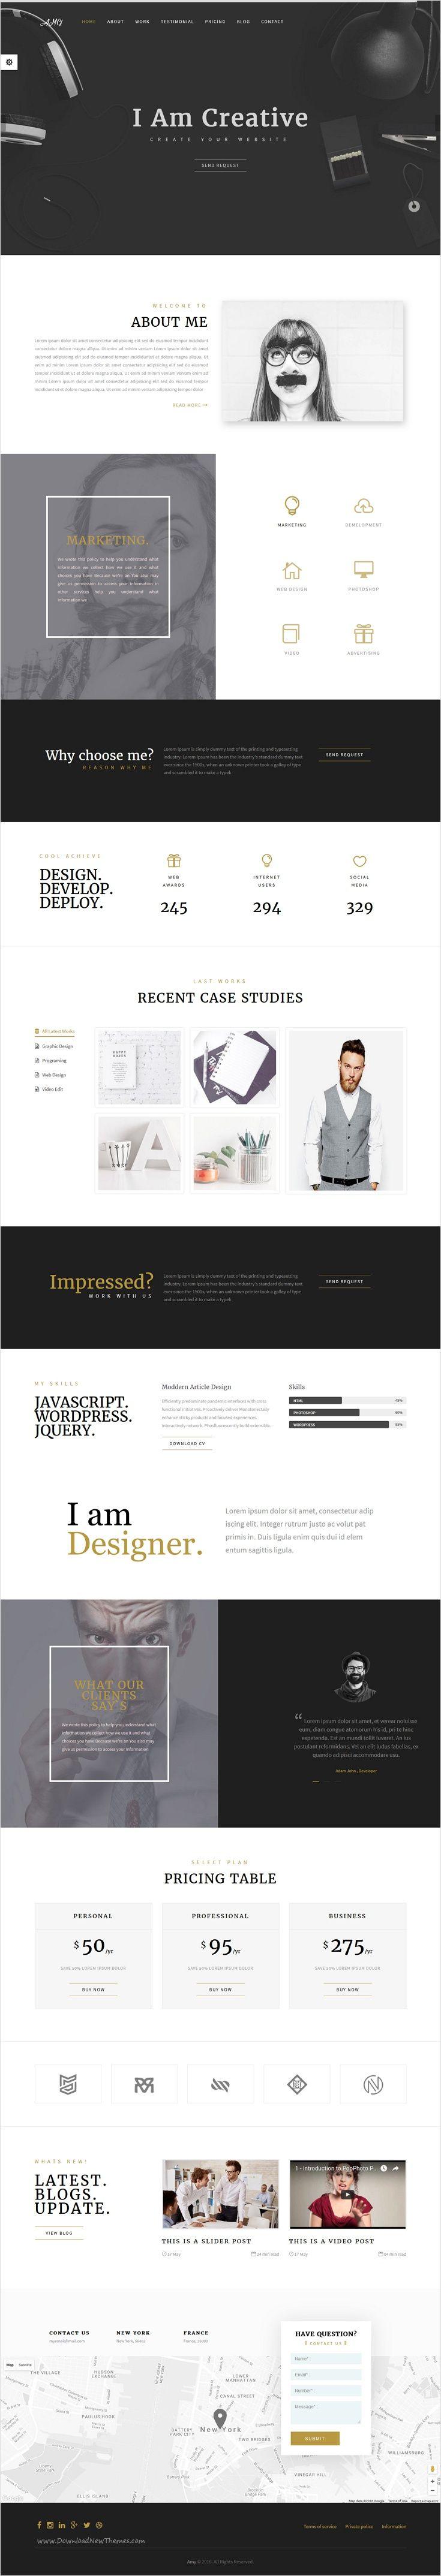 Amy - Responsive Corporate, Business & Portfolio Template ...